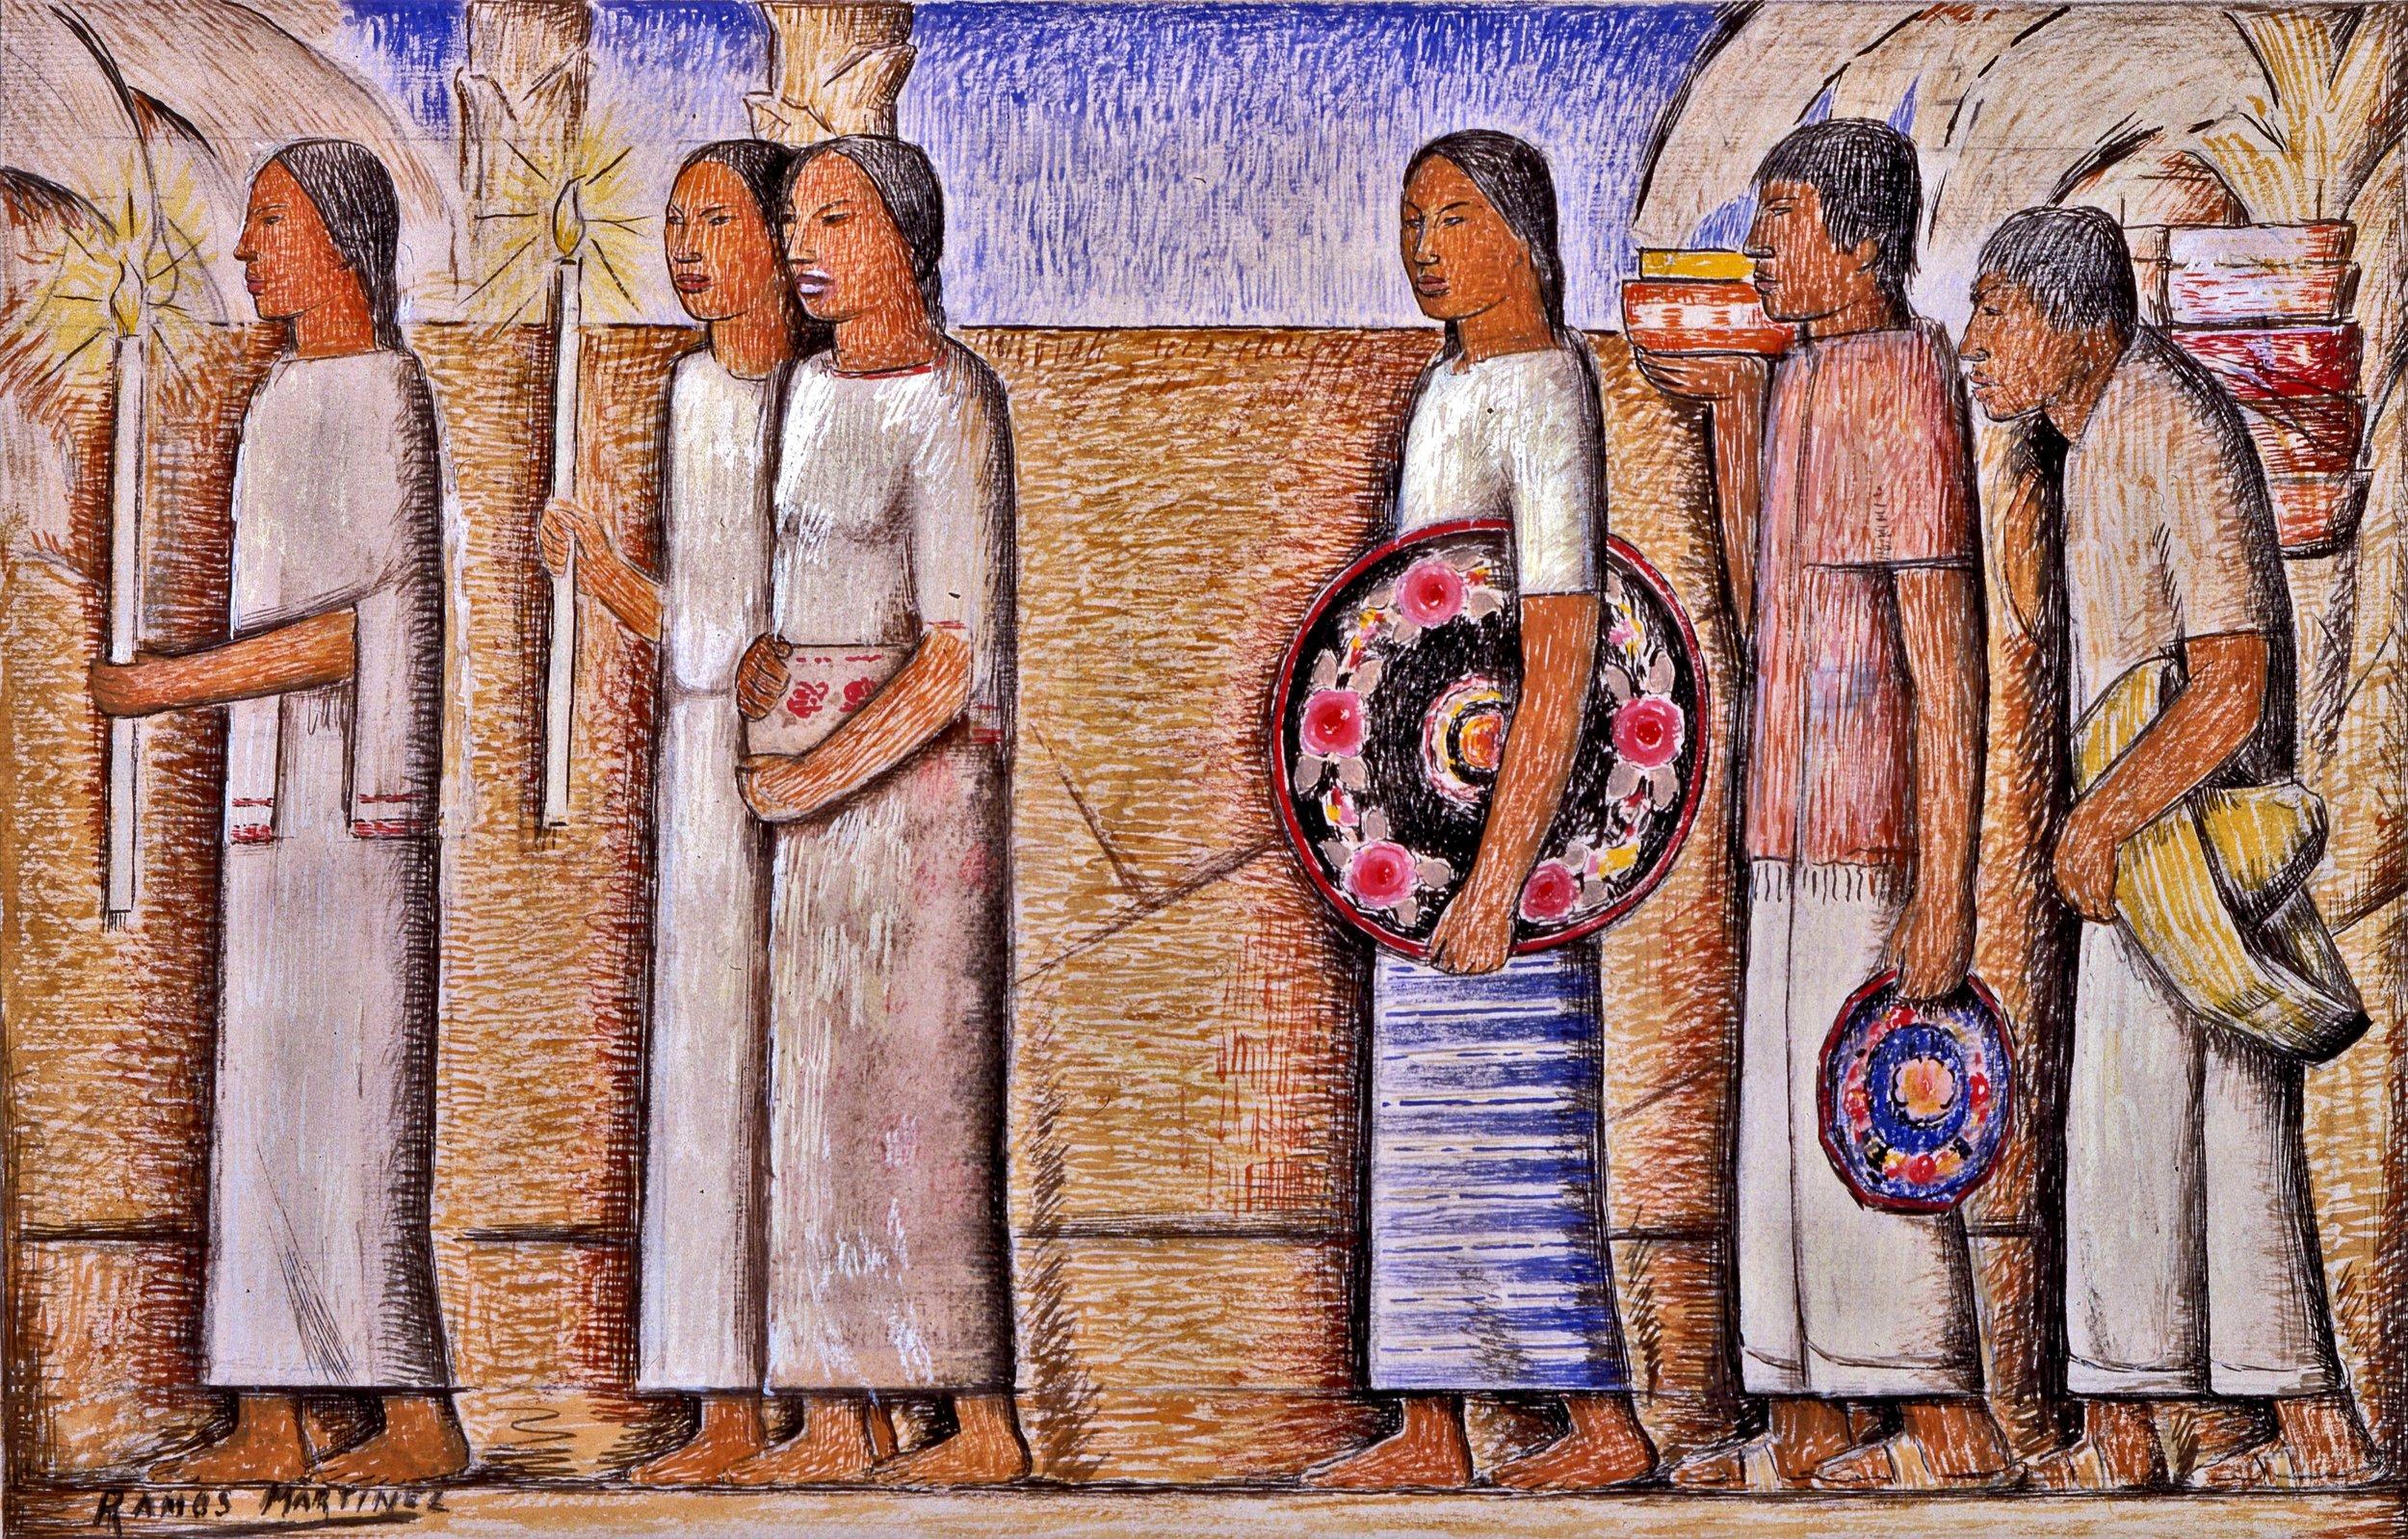 La Procesión / The Procession  ca. 1935 tempera, ink, and graphite on paper / temple, tinta y grafito sobre papel 10.8 x 17 inches / 27.3 x 43.2 centímetros Private collection